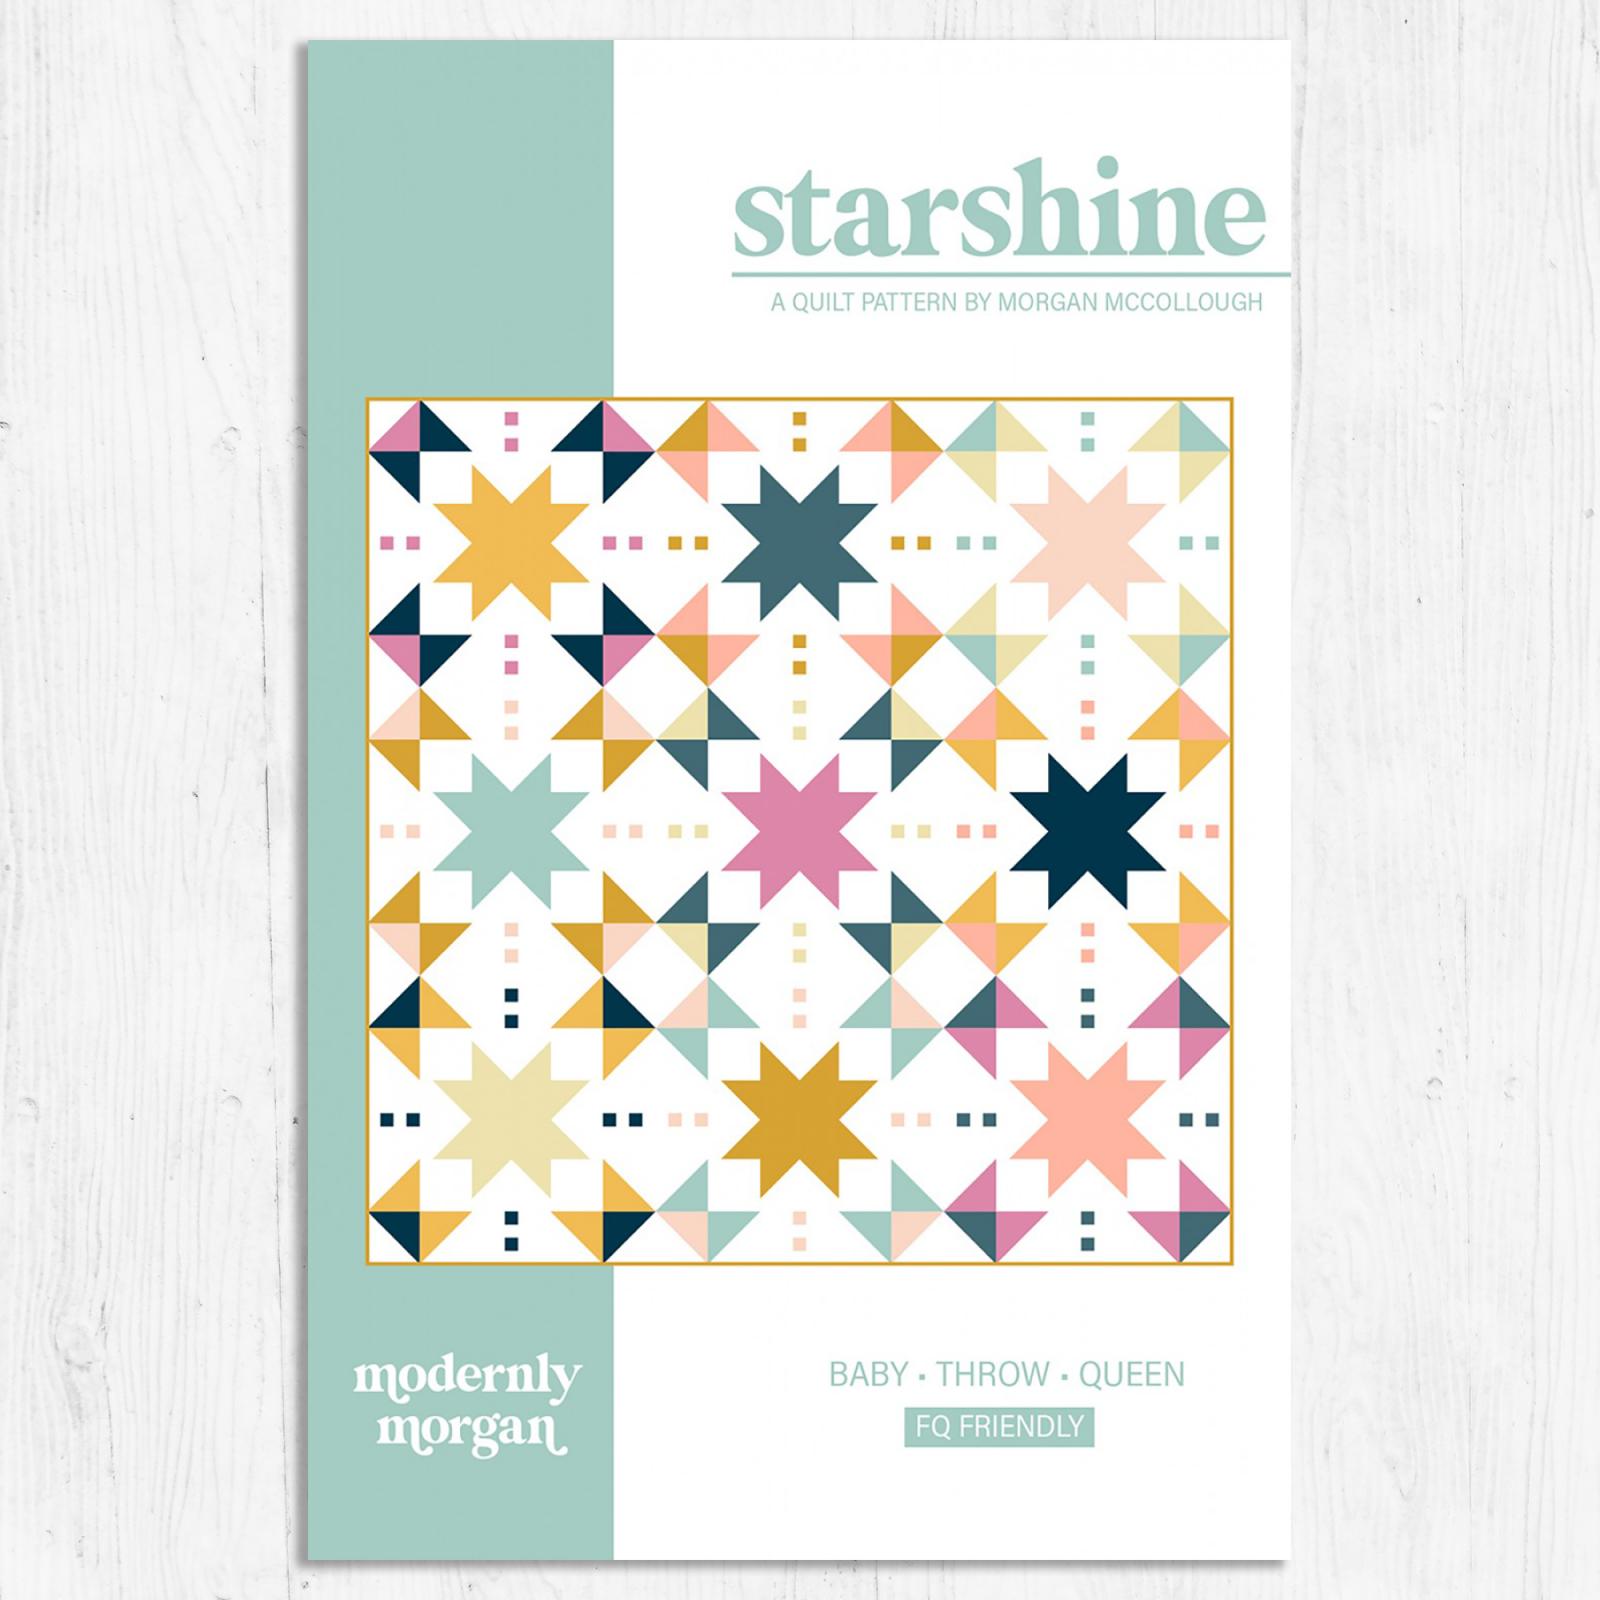 Modernly Morgan - Starshine Quilt